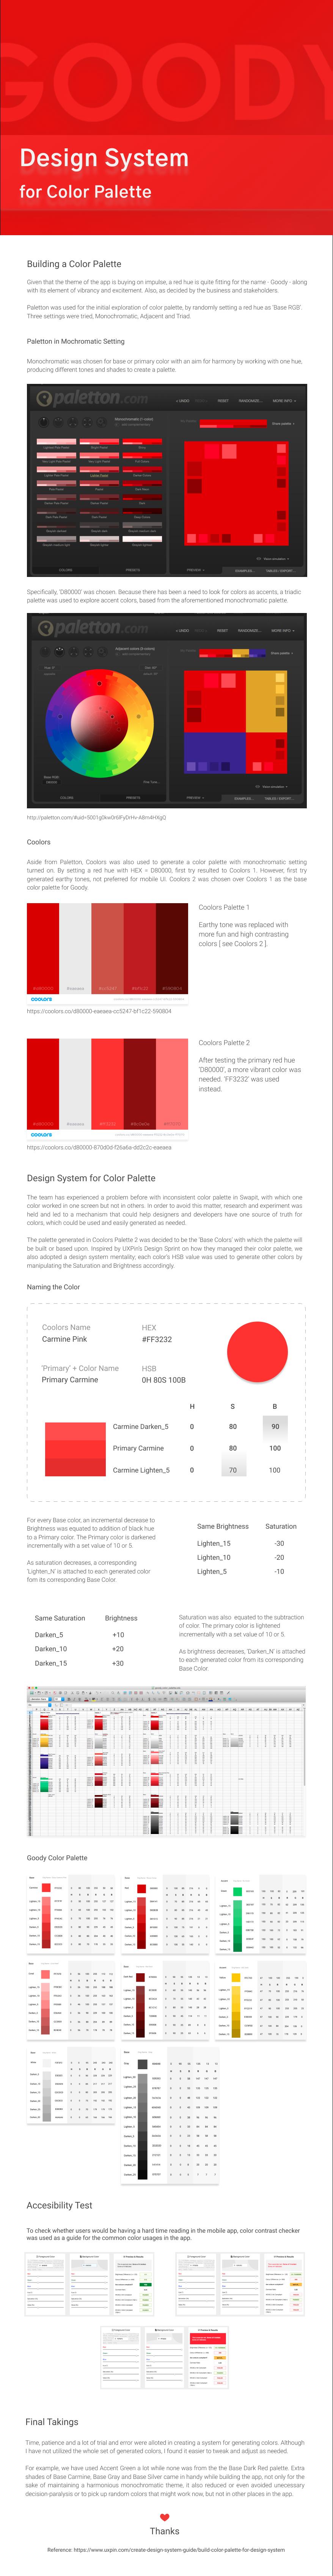 design system color palette goody UI/UX